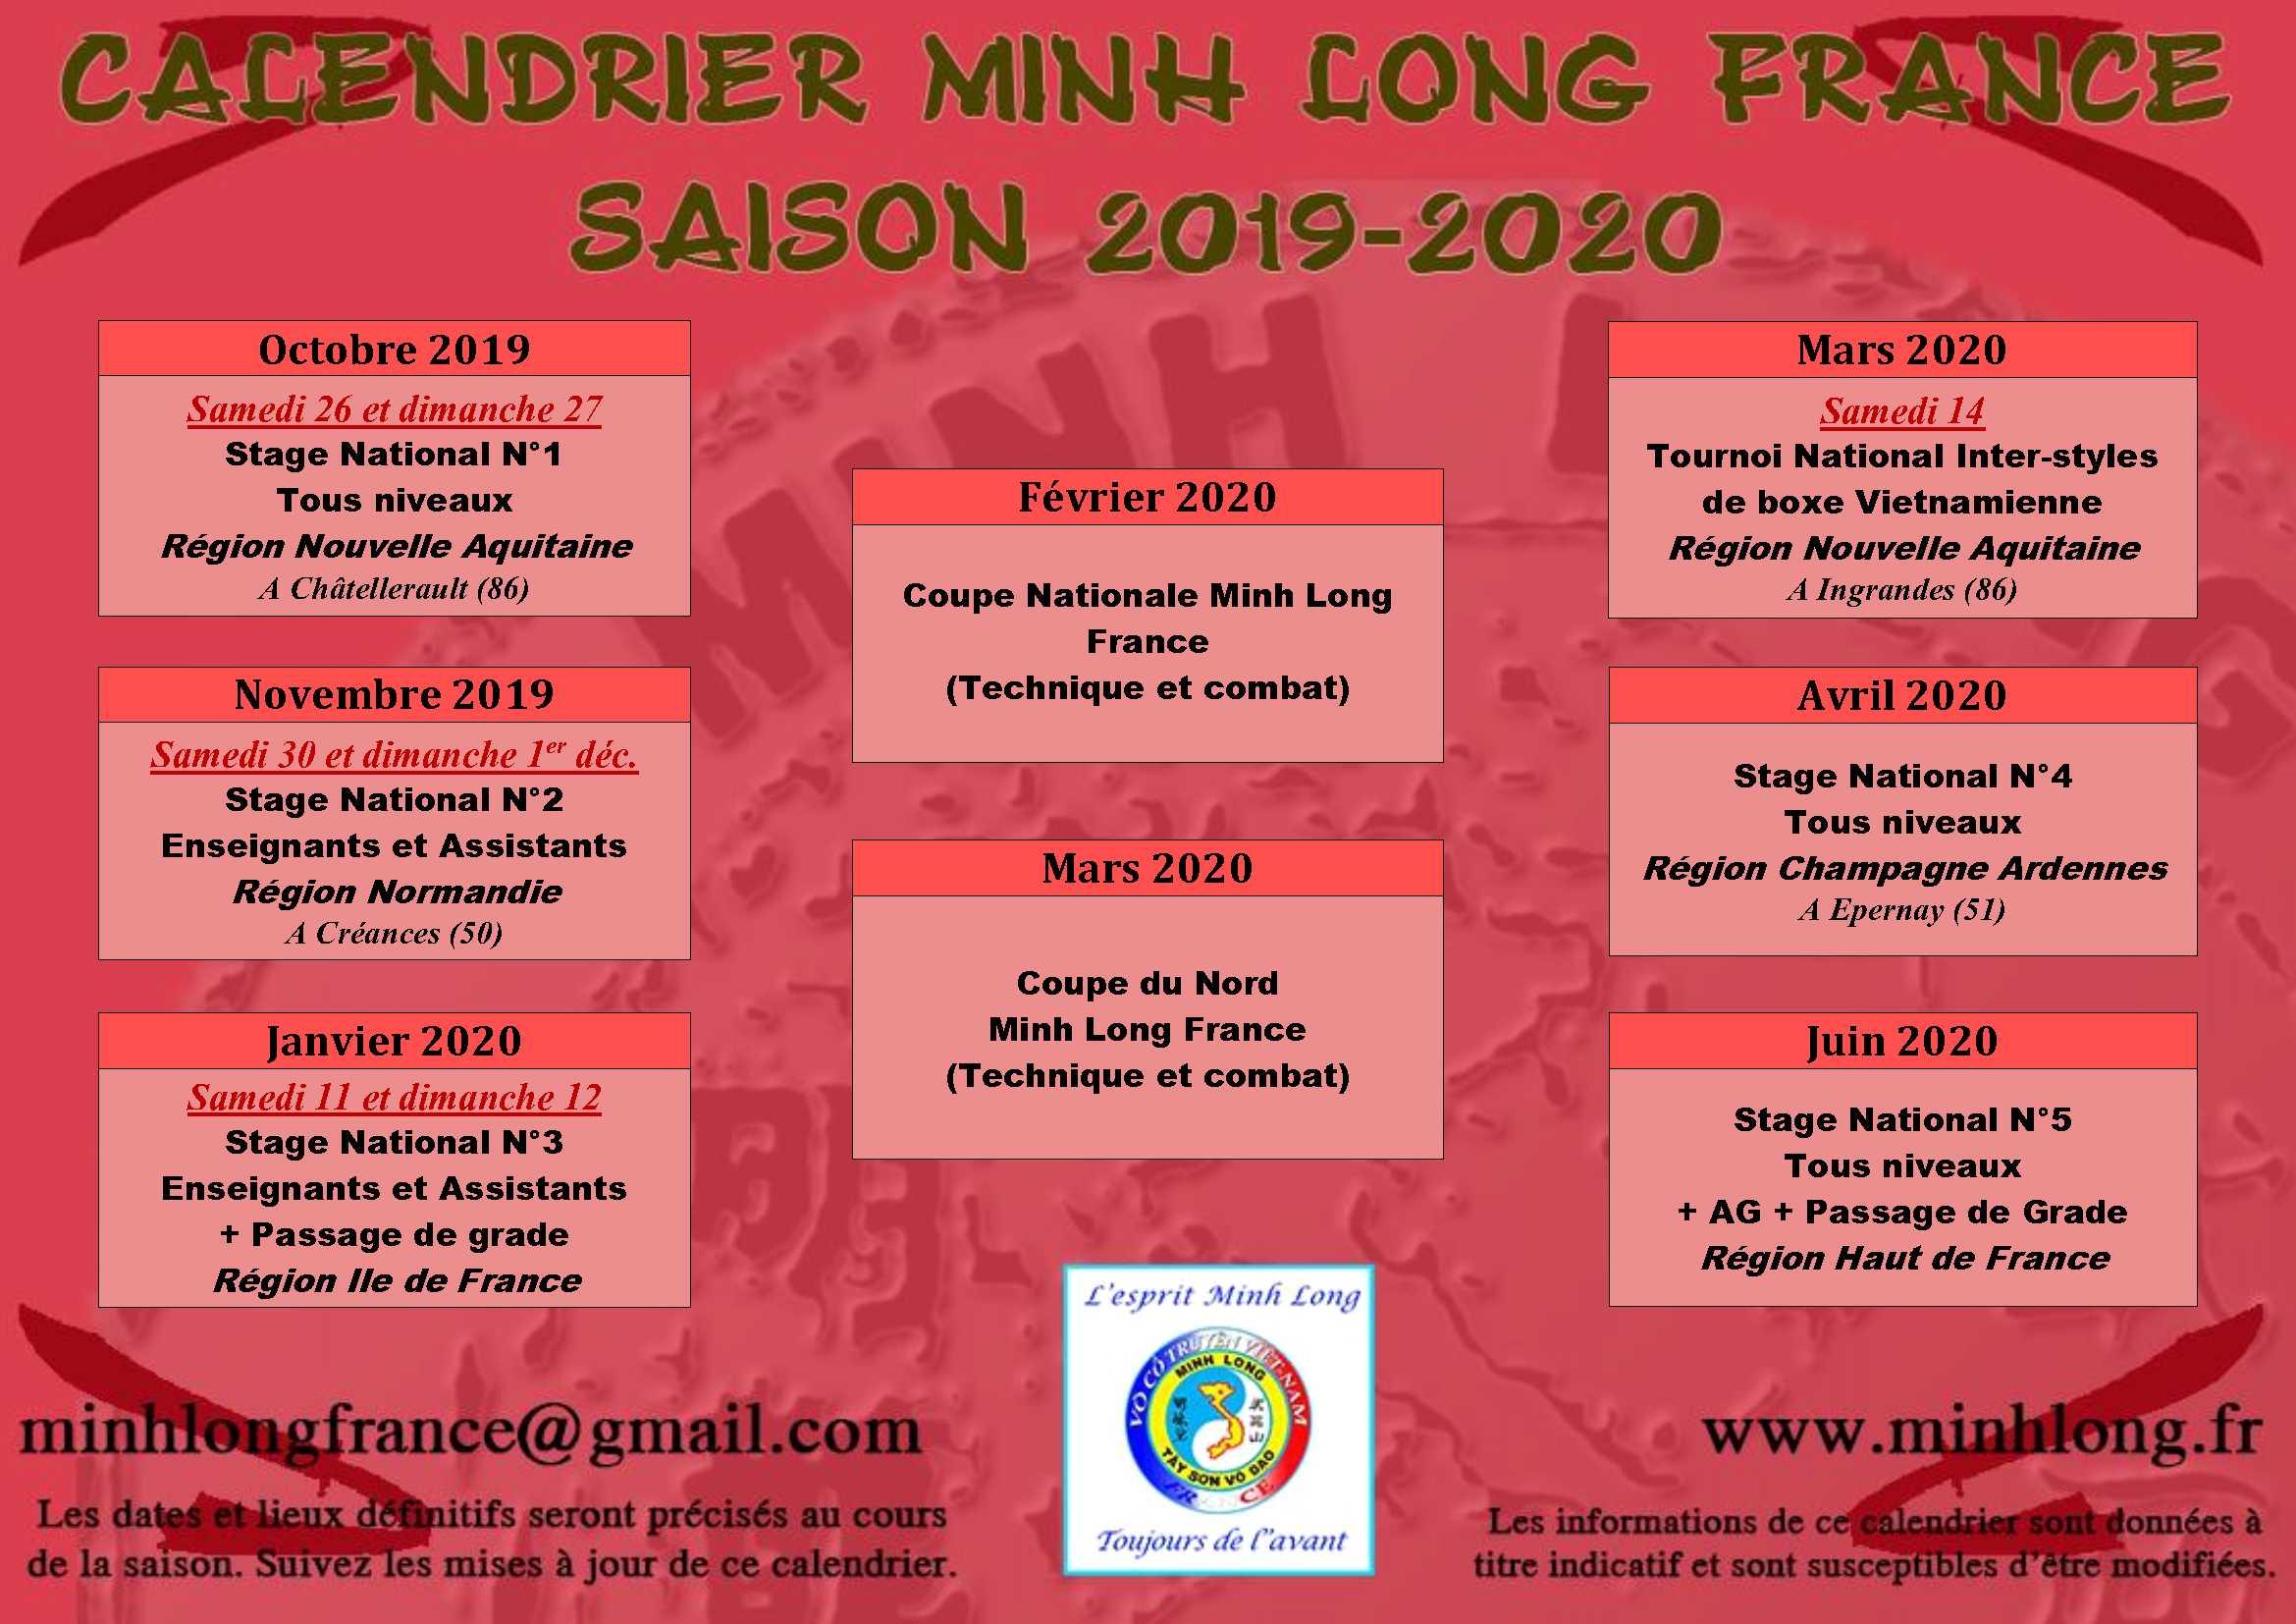 Calendrier Ffkda 2019 2020.Novembre 2014 Minh Long France